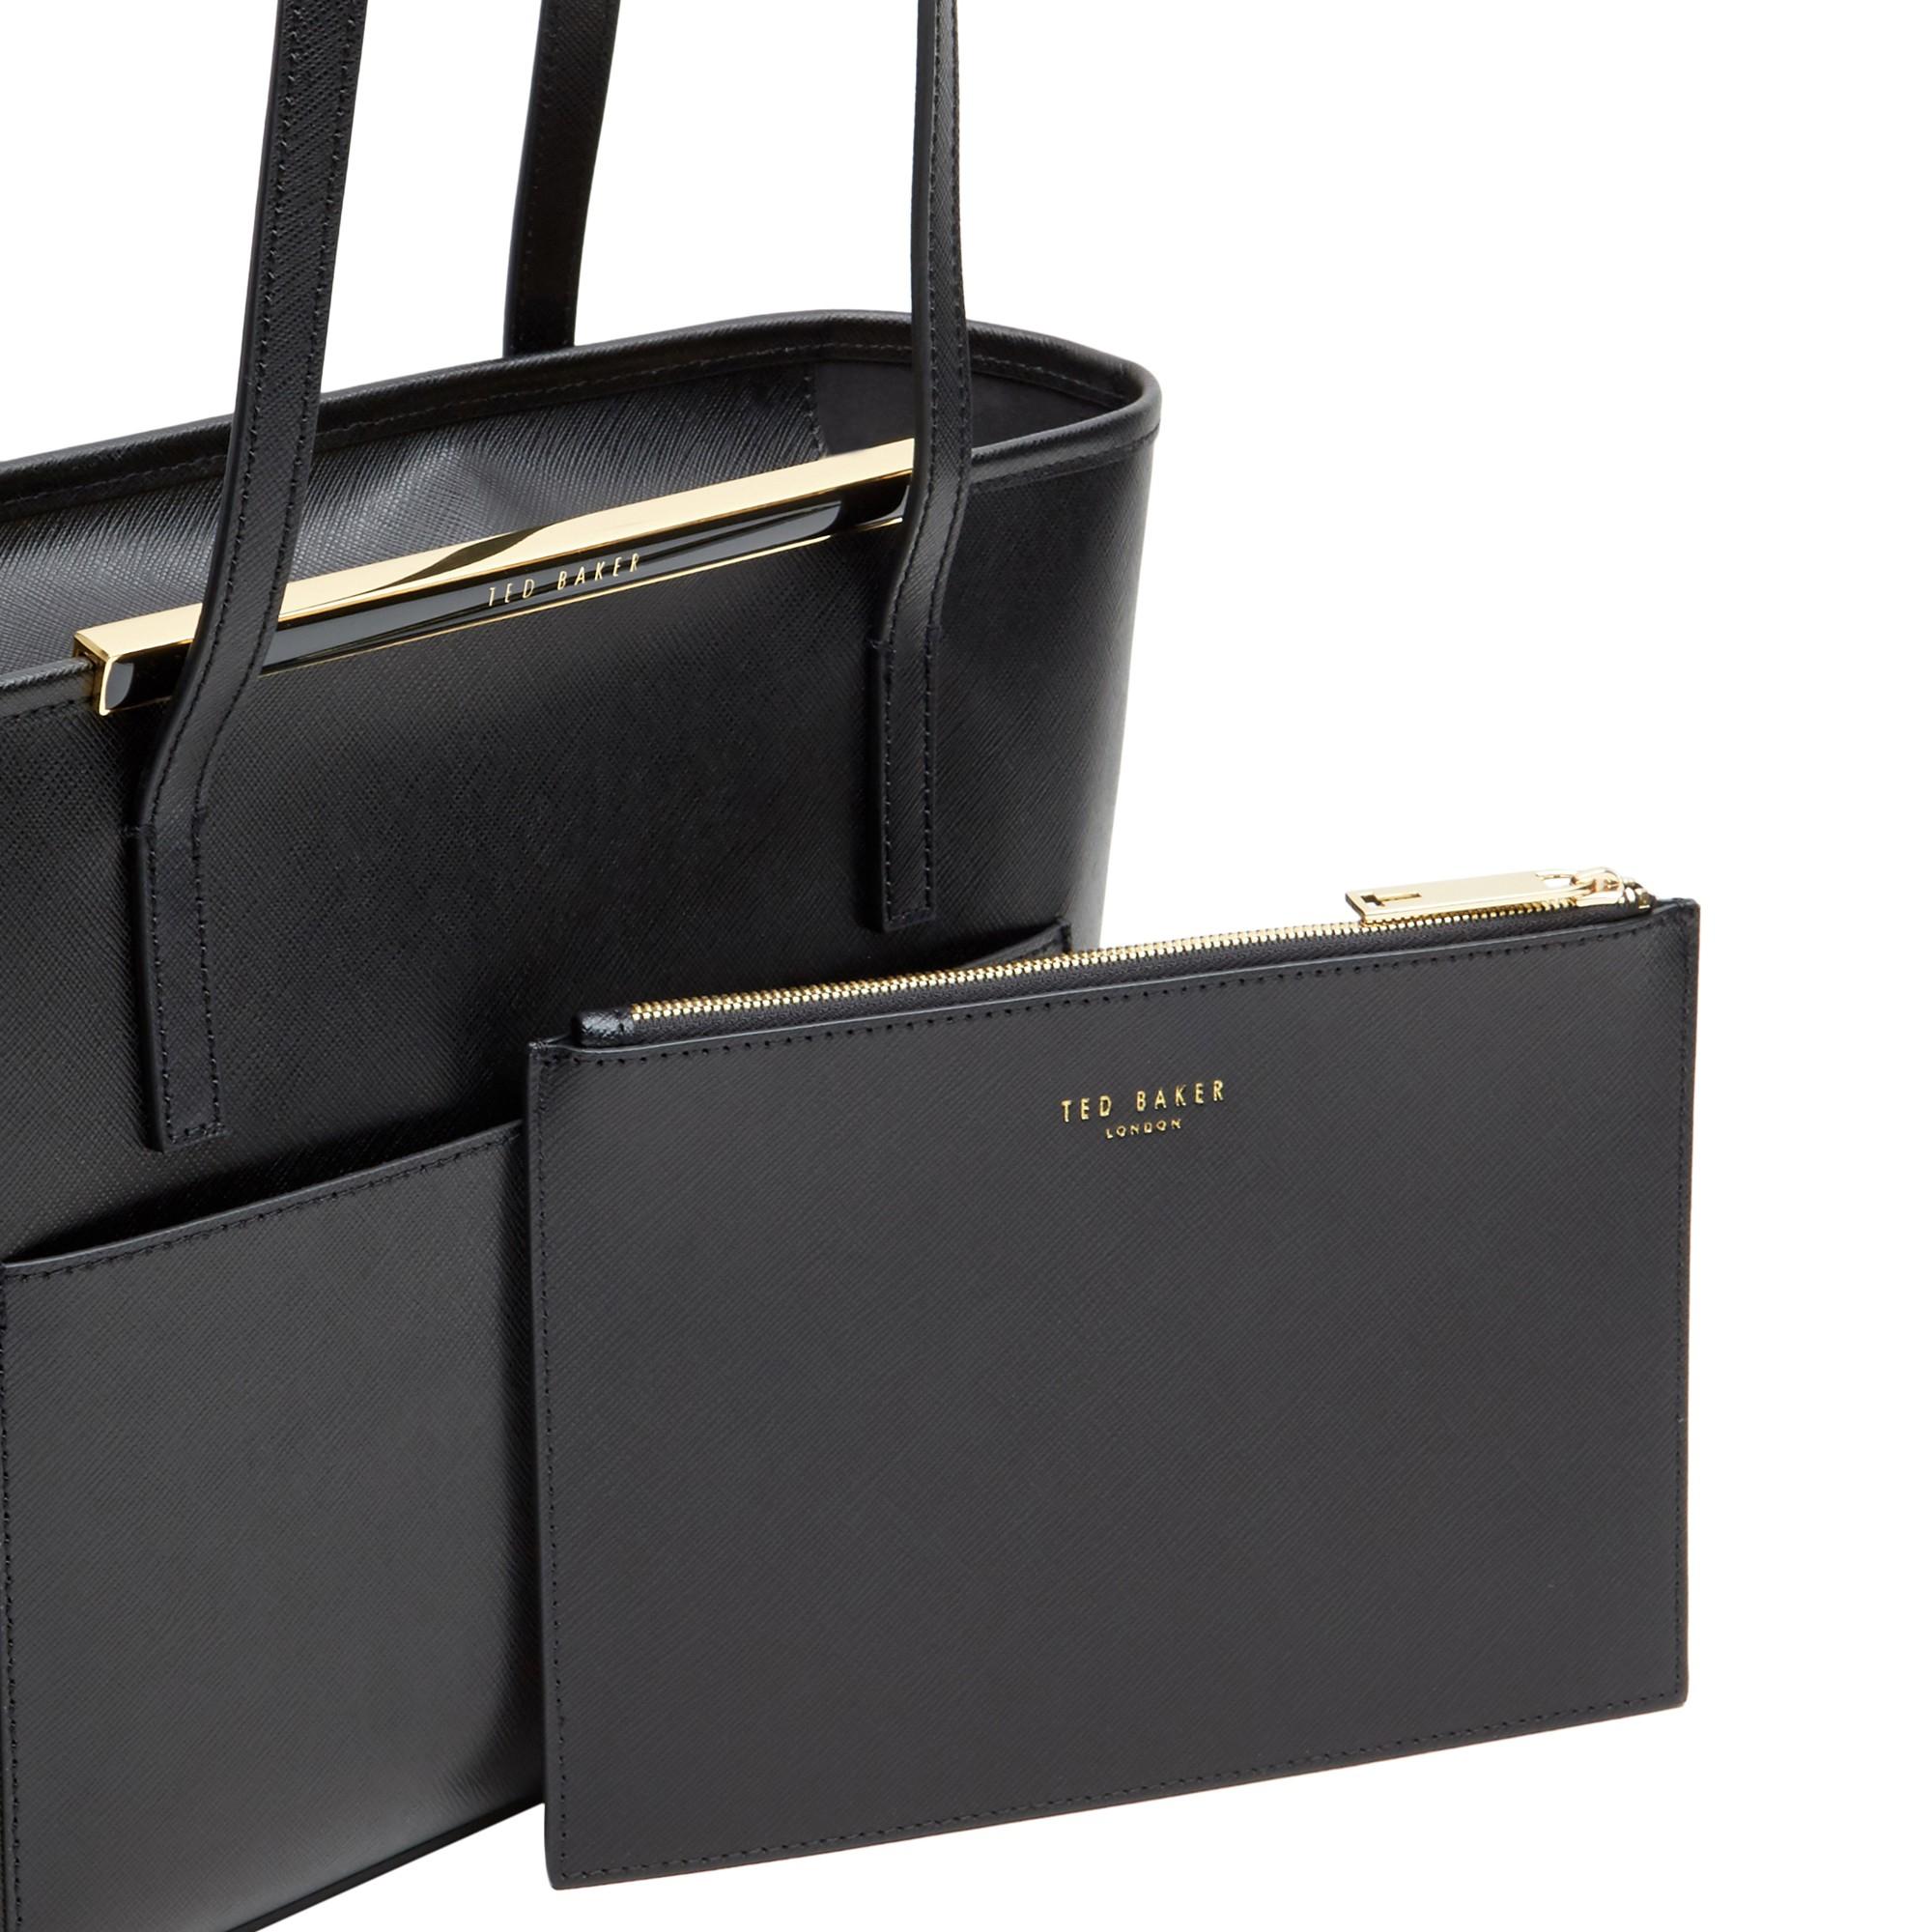 160cbfaec Ted Baker Amilee Small Crosshatch Leather Shopper Bag in Black - Lyst